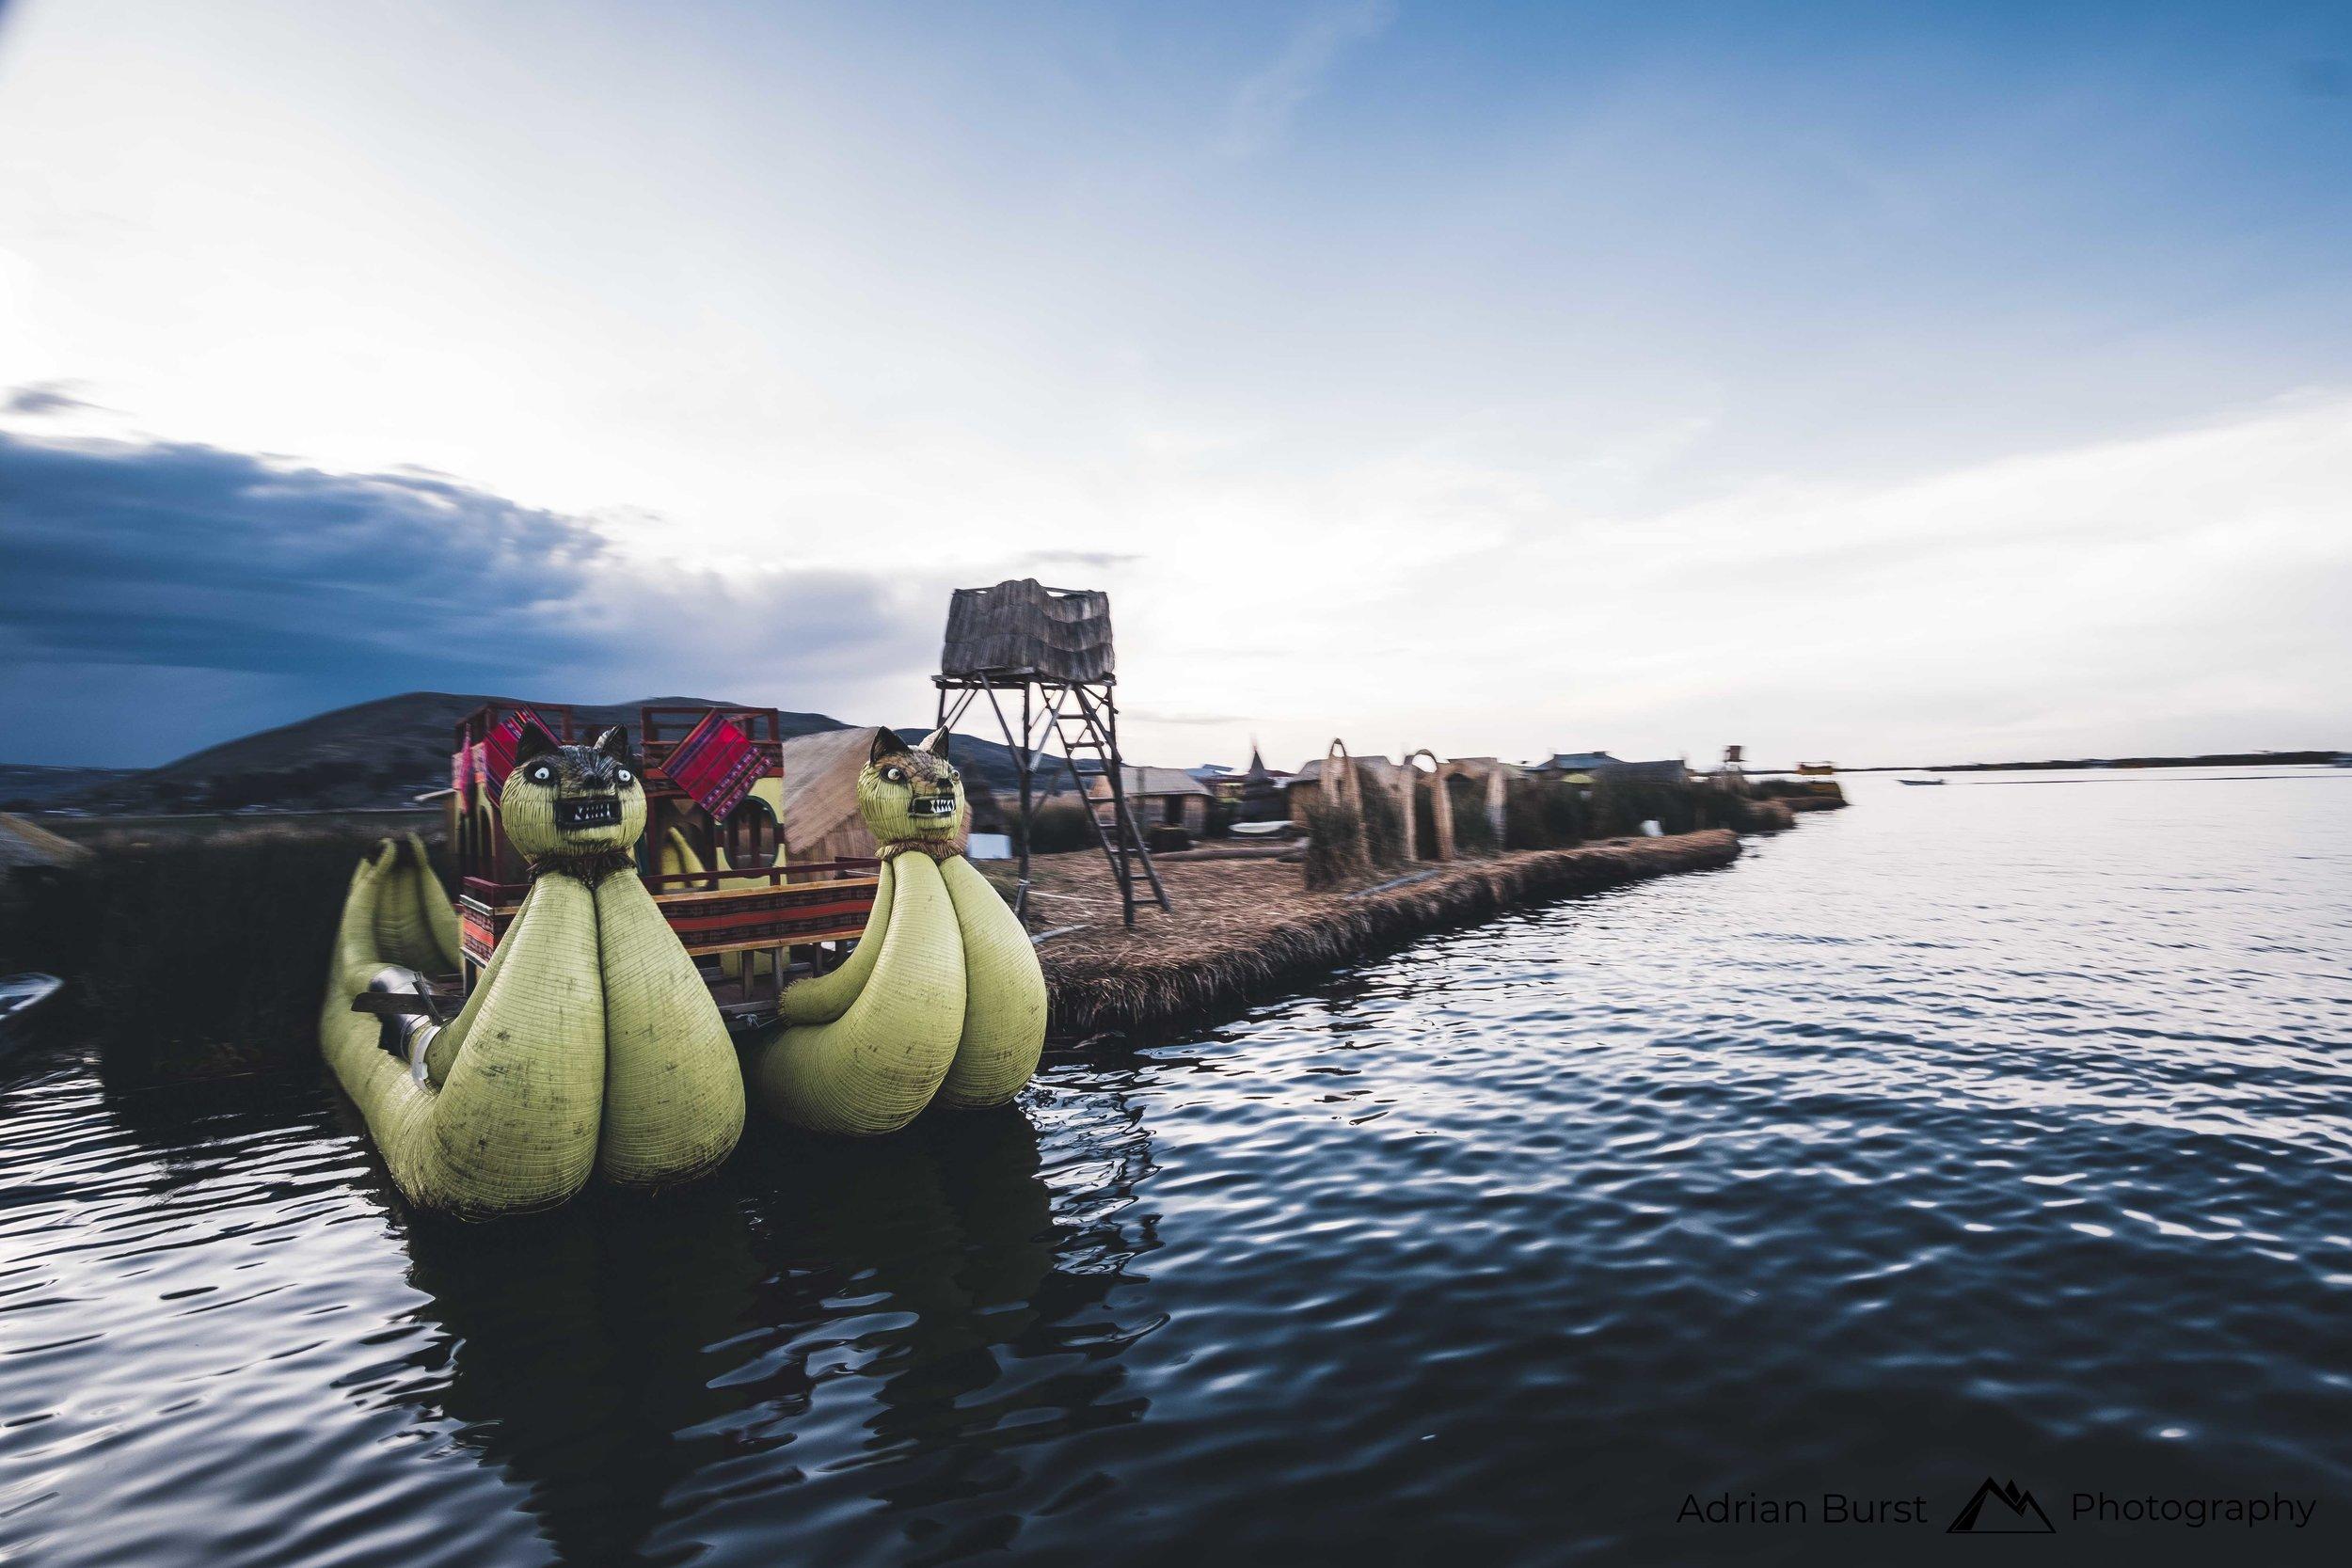 140 | Floating islands, Titicaca lake, Puno